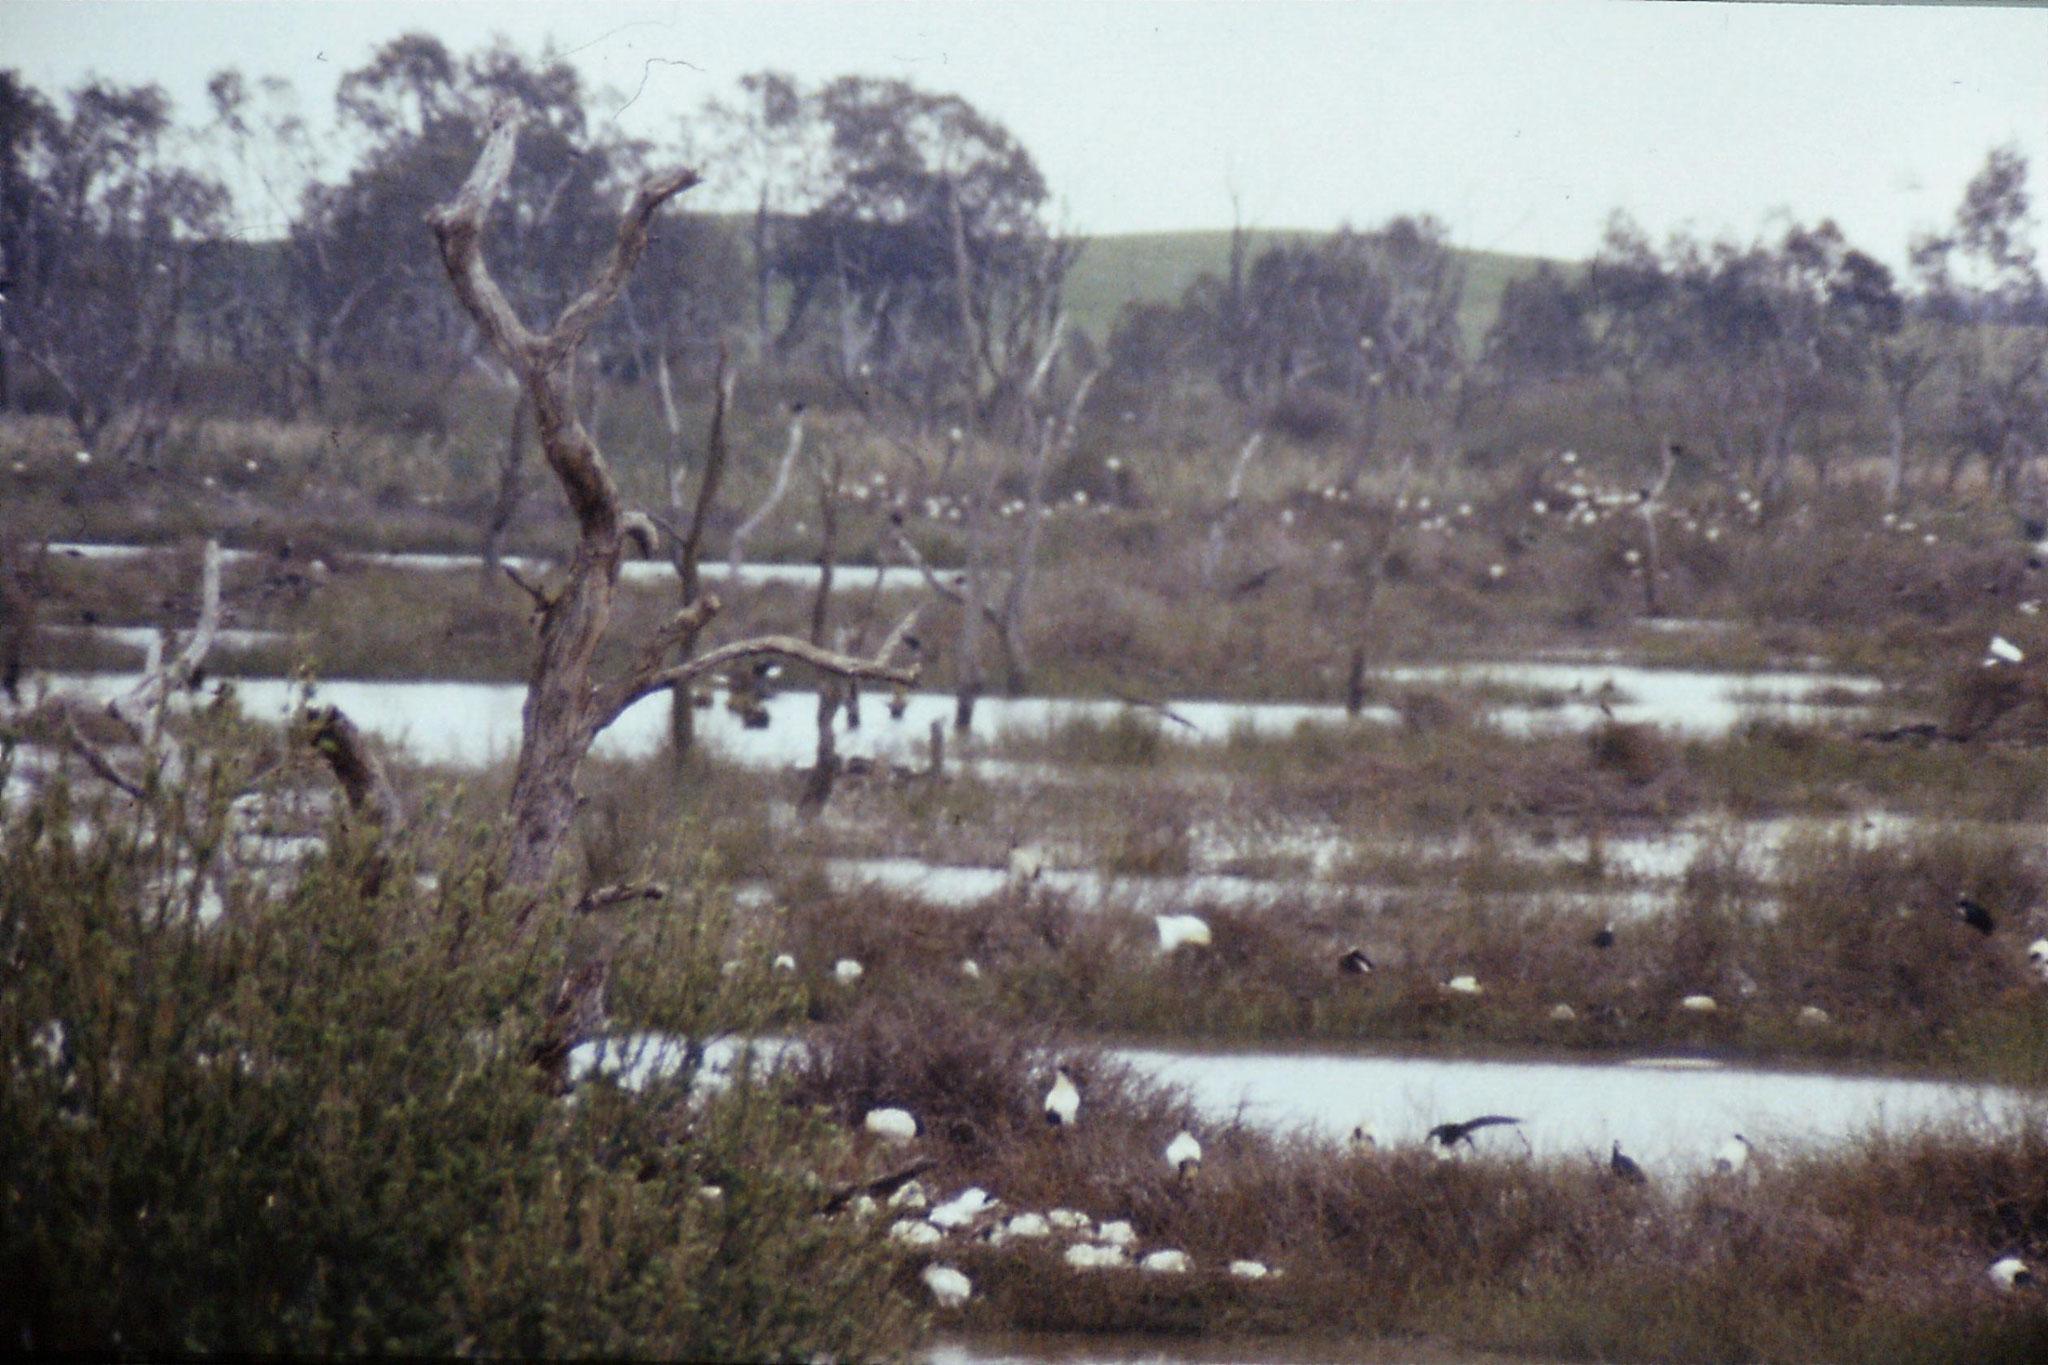 25/9/1990: 21: Kerang, ibis rookery